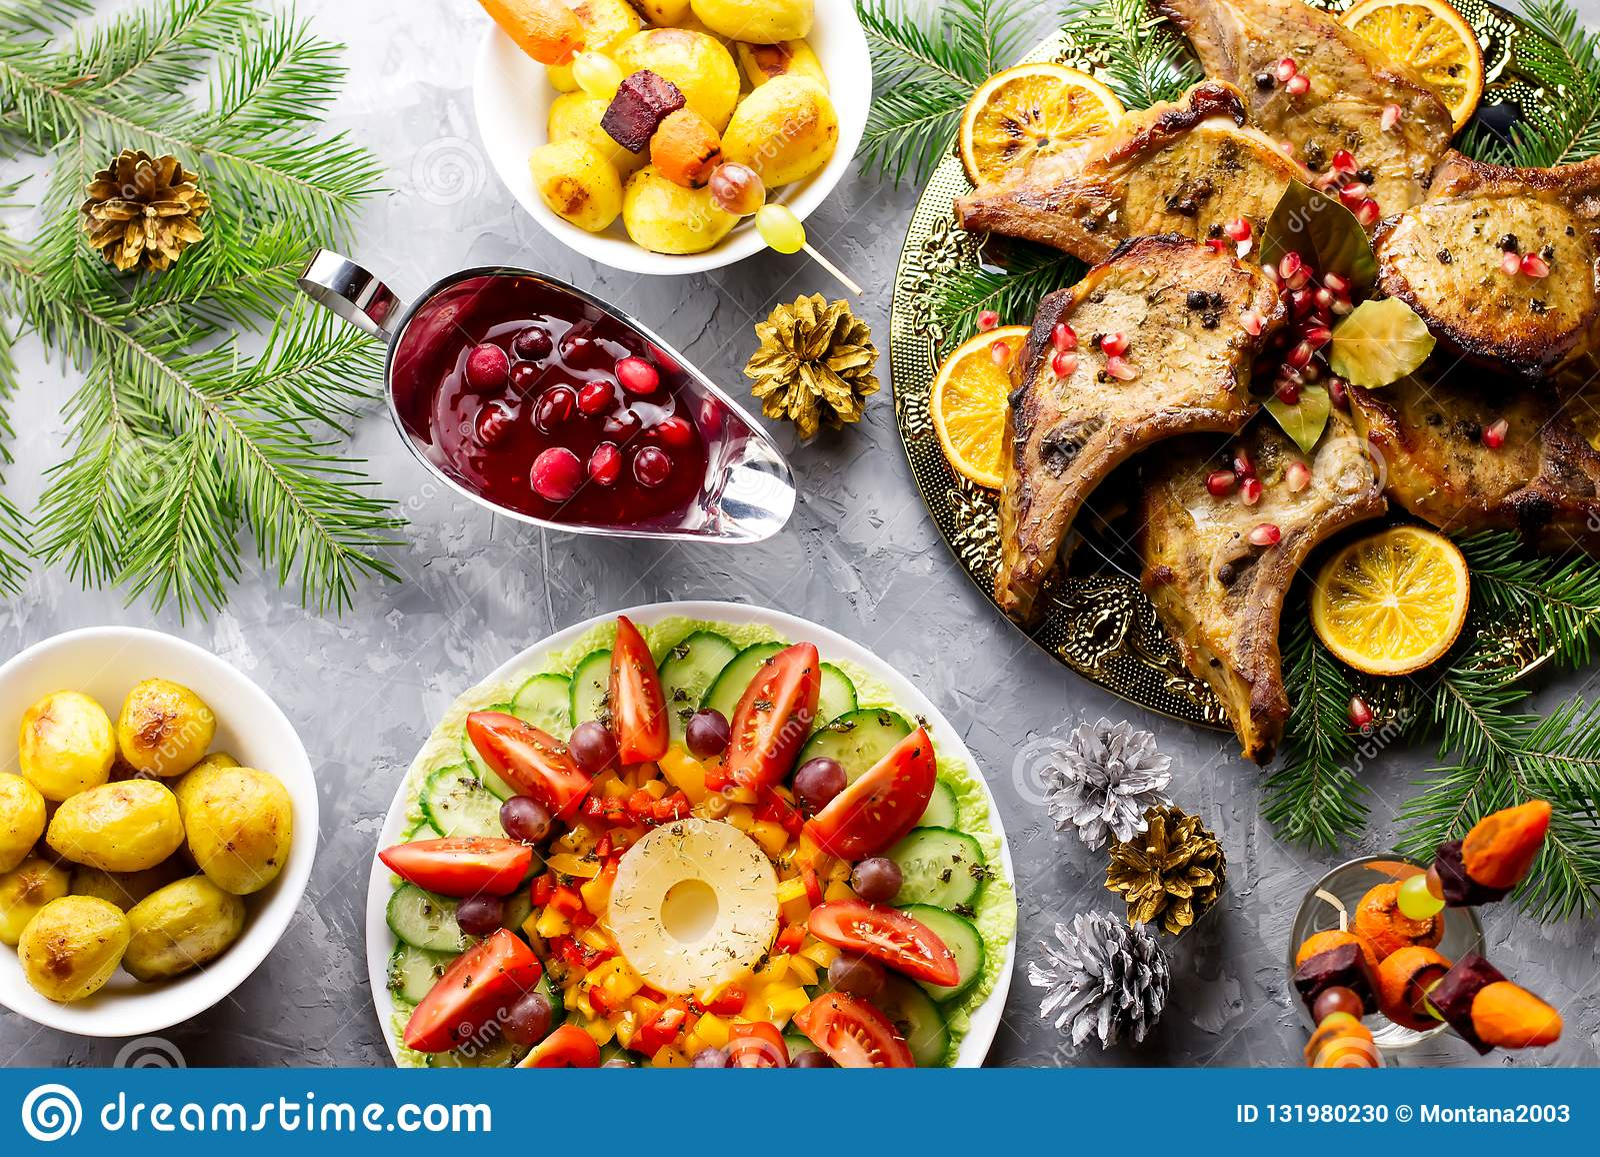 Christmas Dinner With Roasted Meat Steak Christmas Wreath Salad